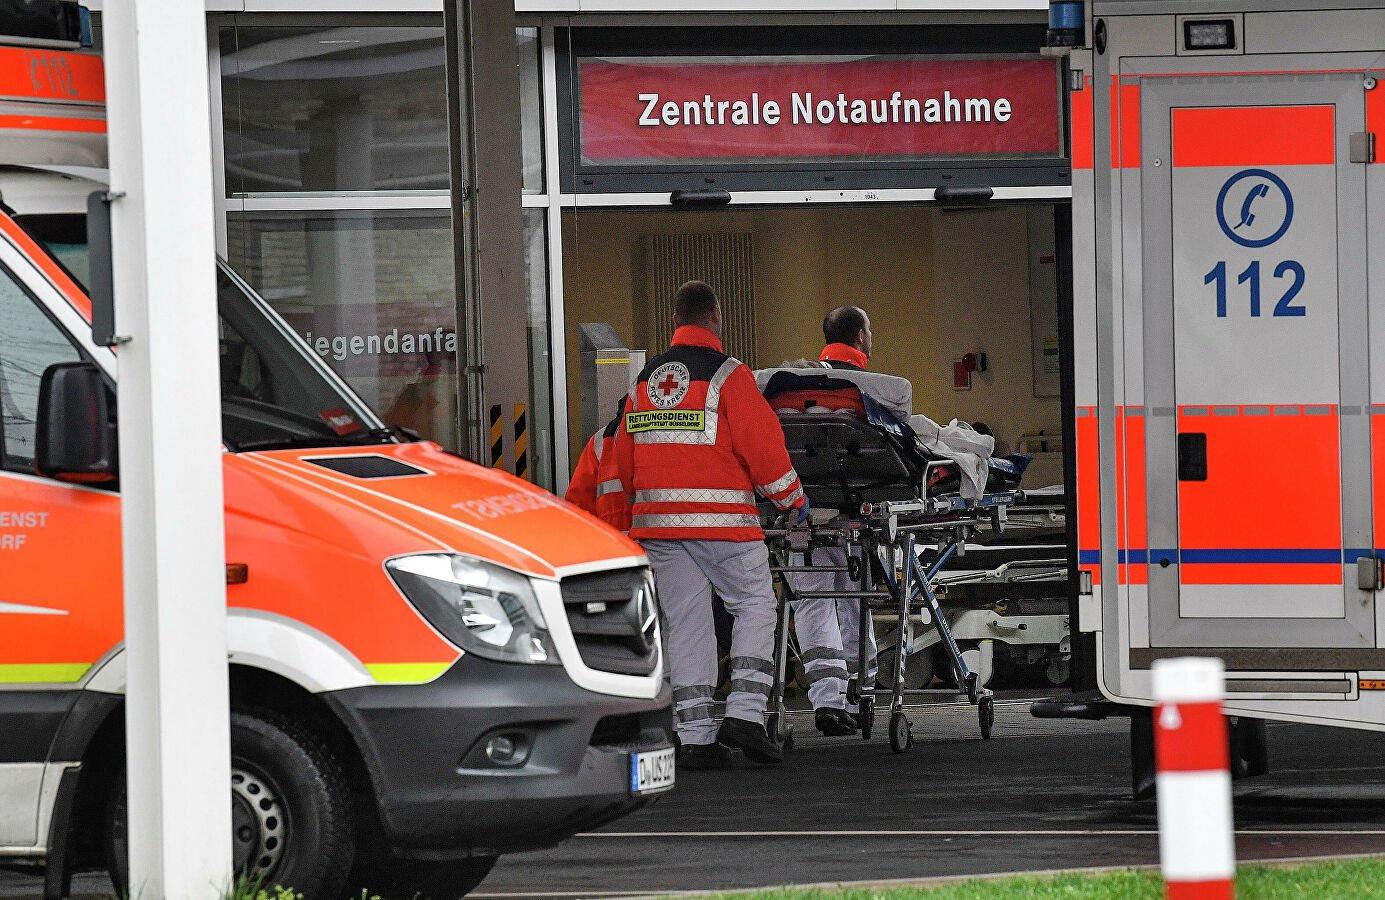 Pfizer's vaccine has made a German medic a COVID incubator